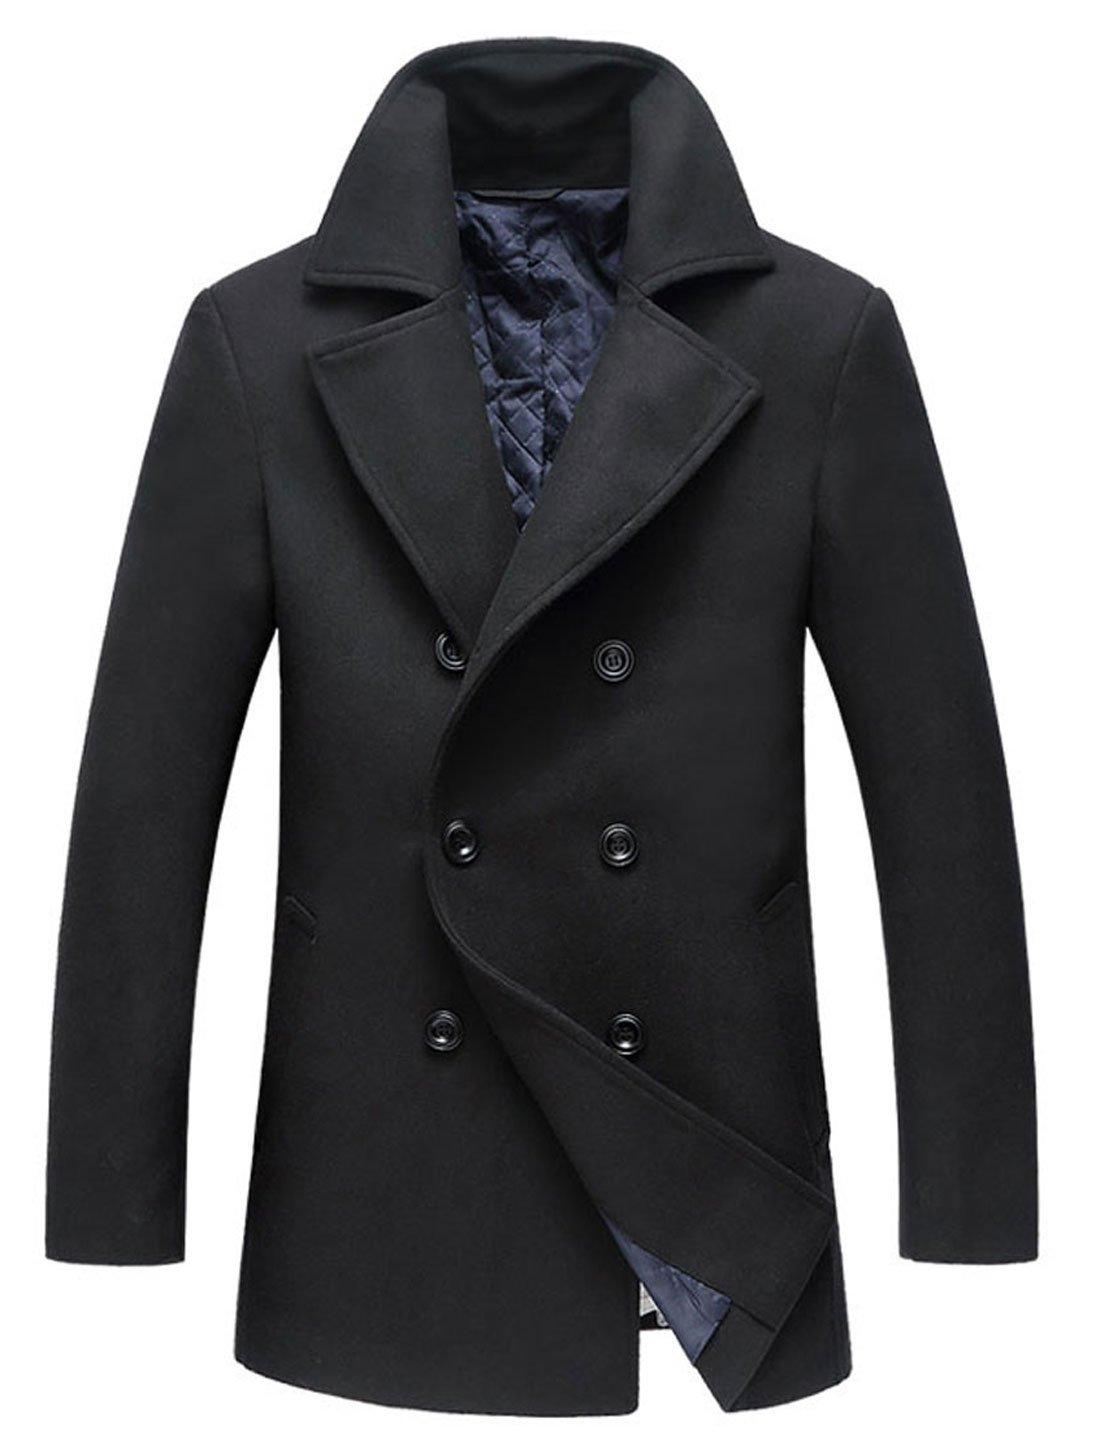 chouyatou Men's Classic Notched Collar Double Breasted Wool Blend Pea Coat (Medium, Black) by chouyatou